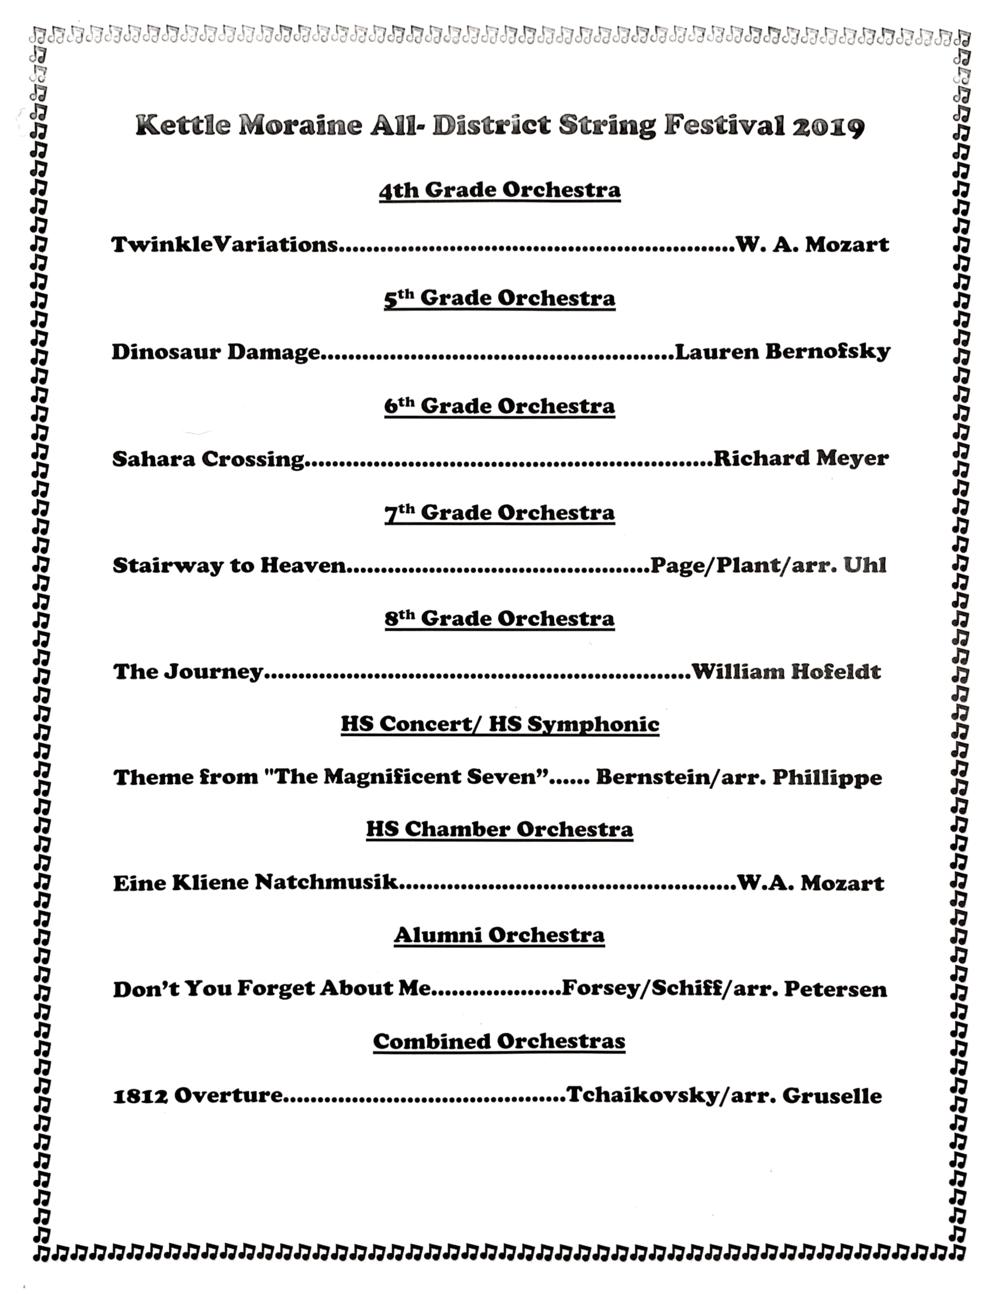 orchestra1-19a.jpg